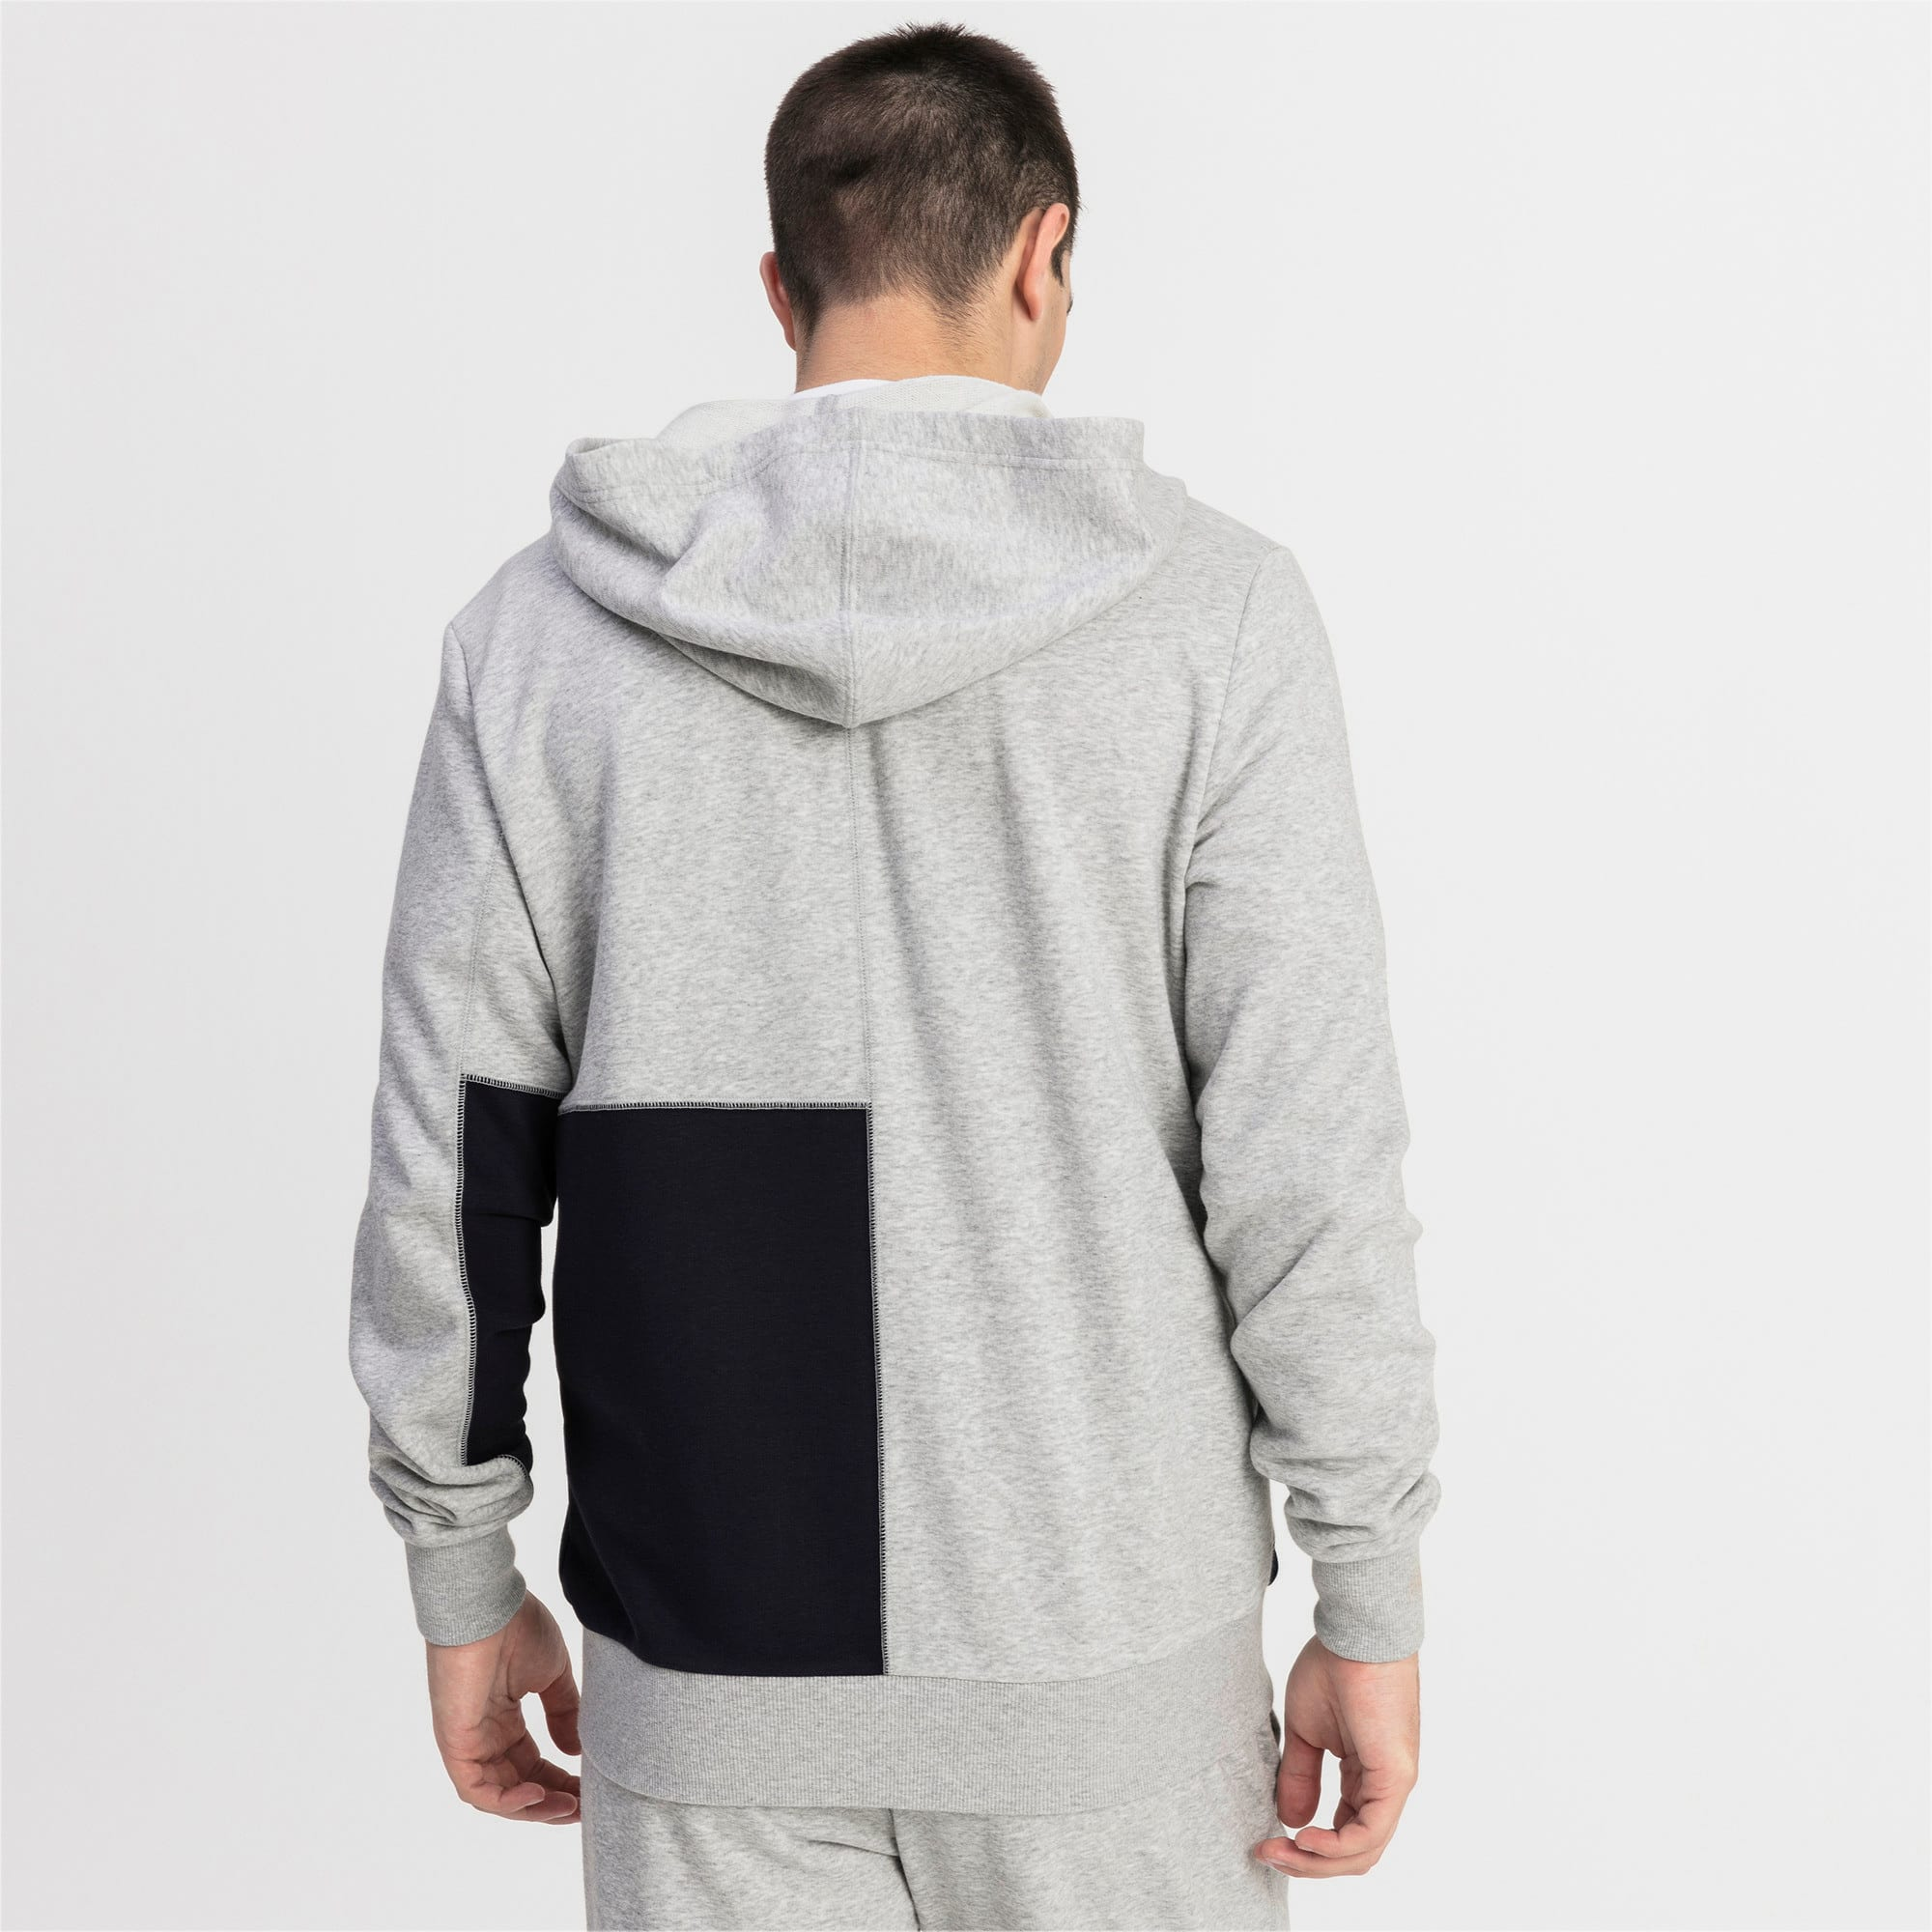 Thumbnail 2 of RBR Logo Hooded Men's Sweat Jacket, Light Gray Heather, medium